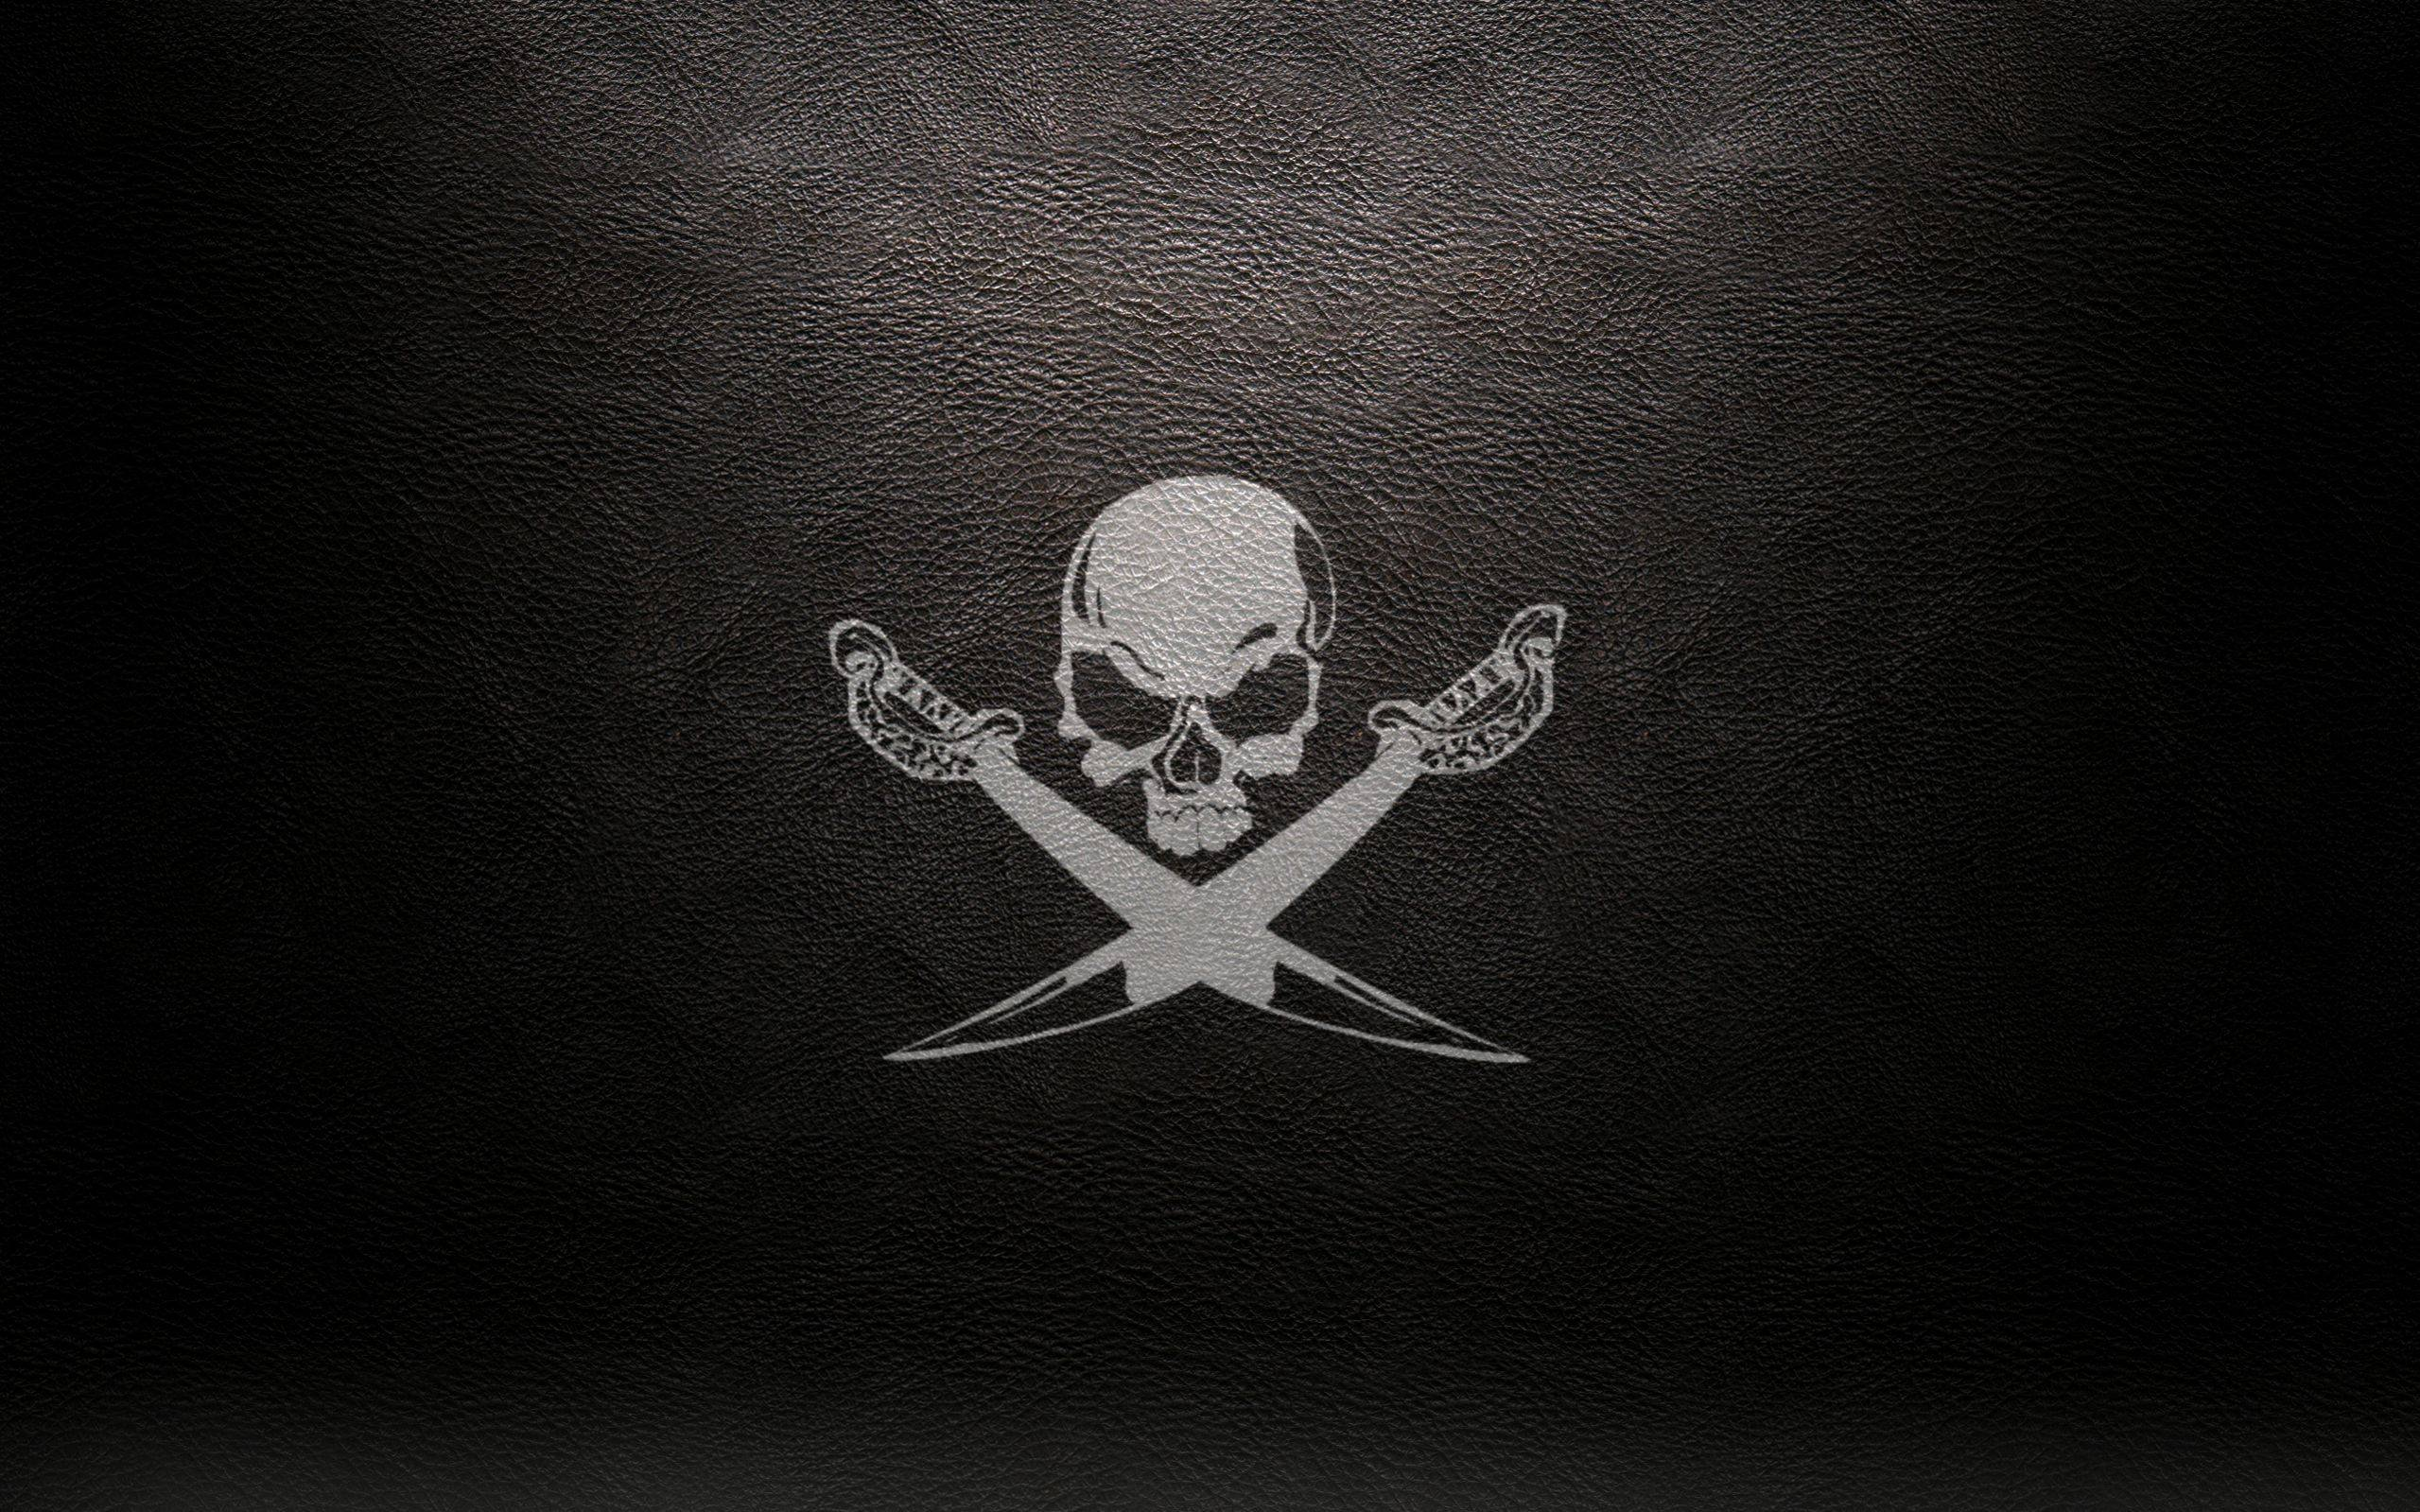 pirat wallpaper windows thema - photo #46